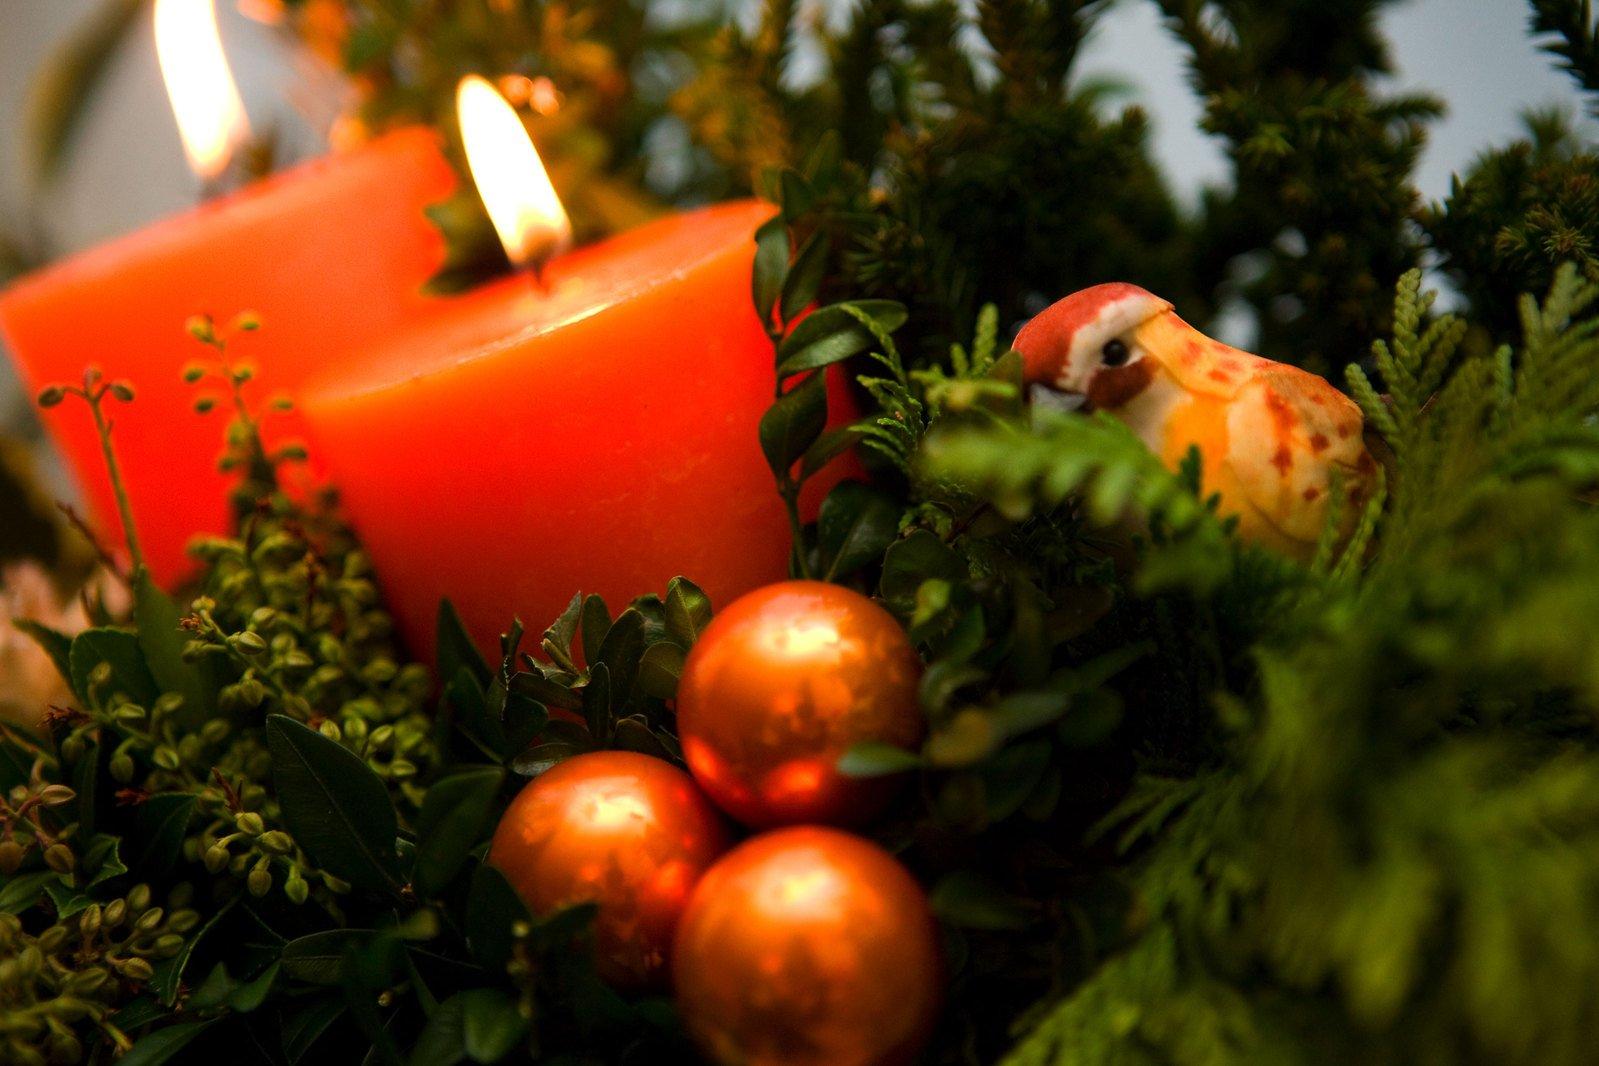 Free Weihnachten-Pflanze Stock Photo - FreeImages.com